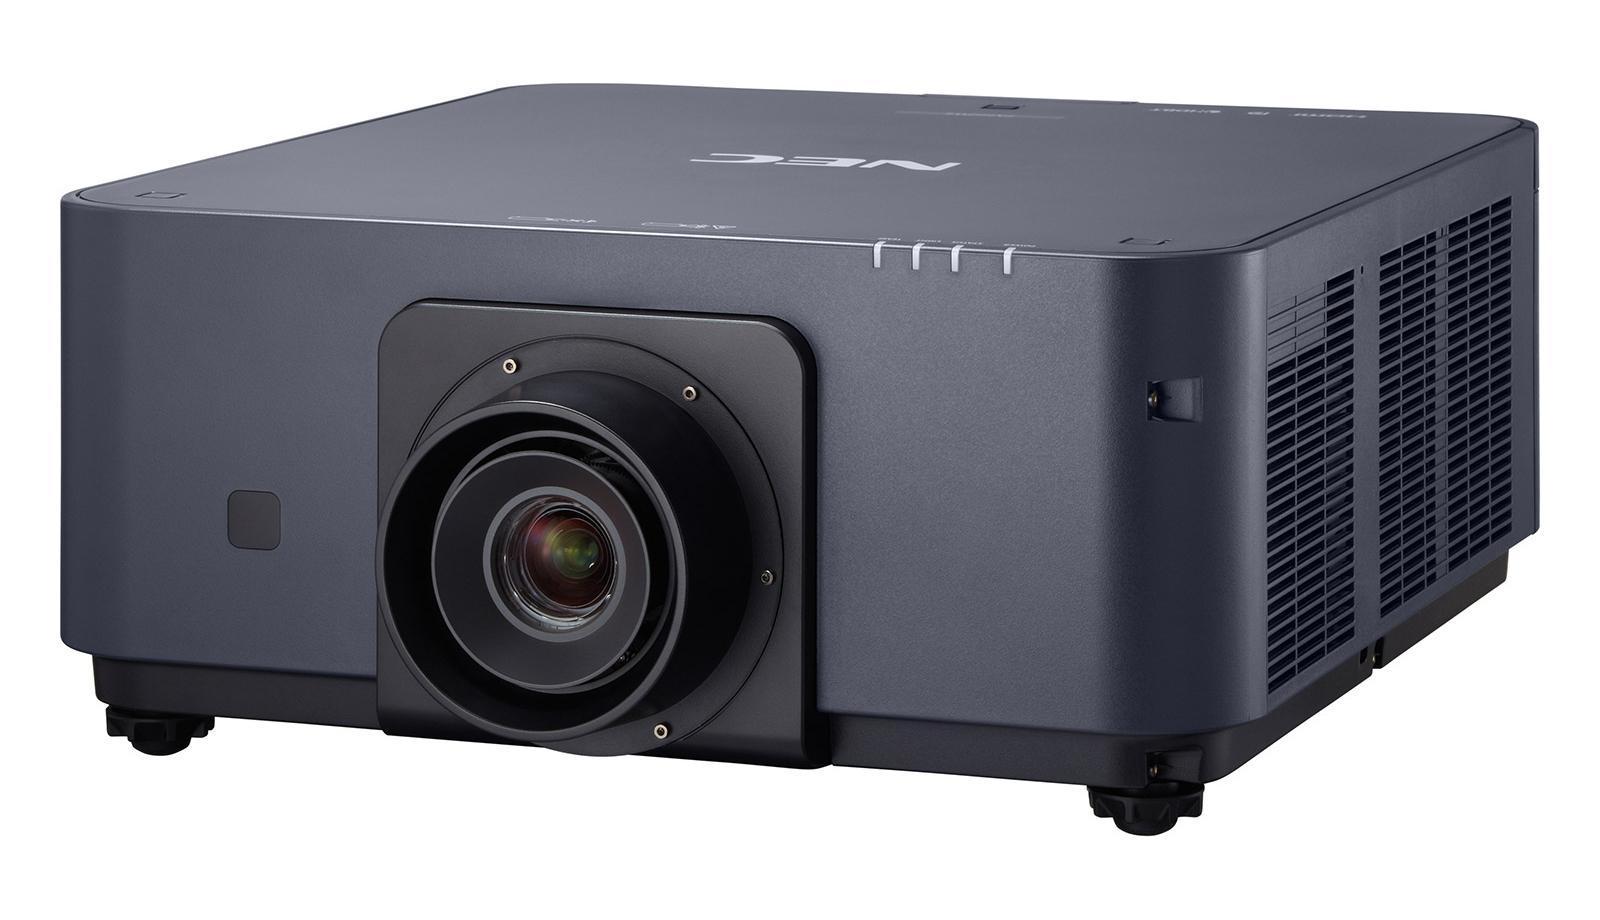 6000 Lumen DLP Laser Installation Projector in Black - Body Only